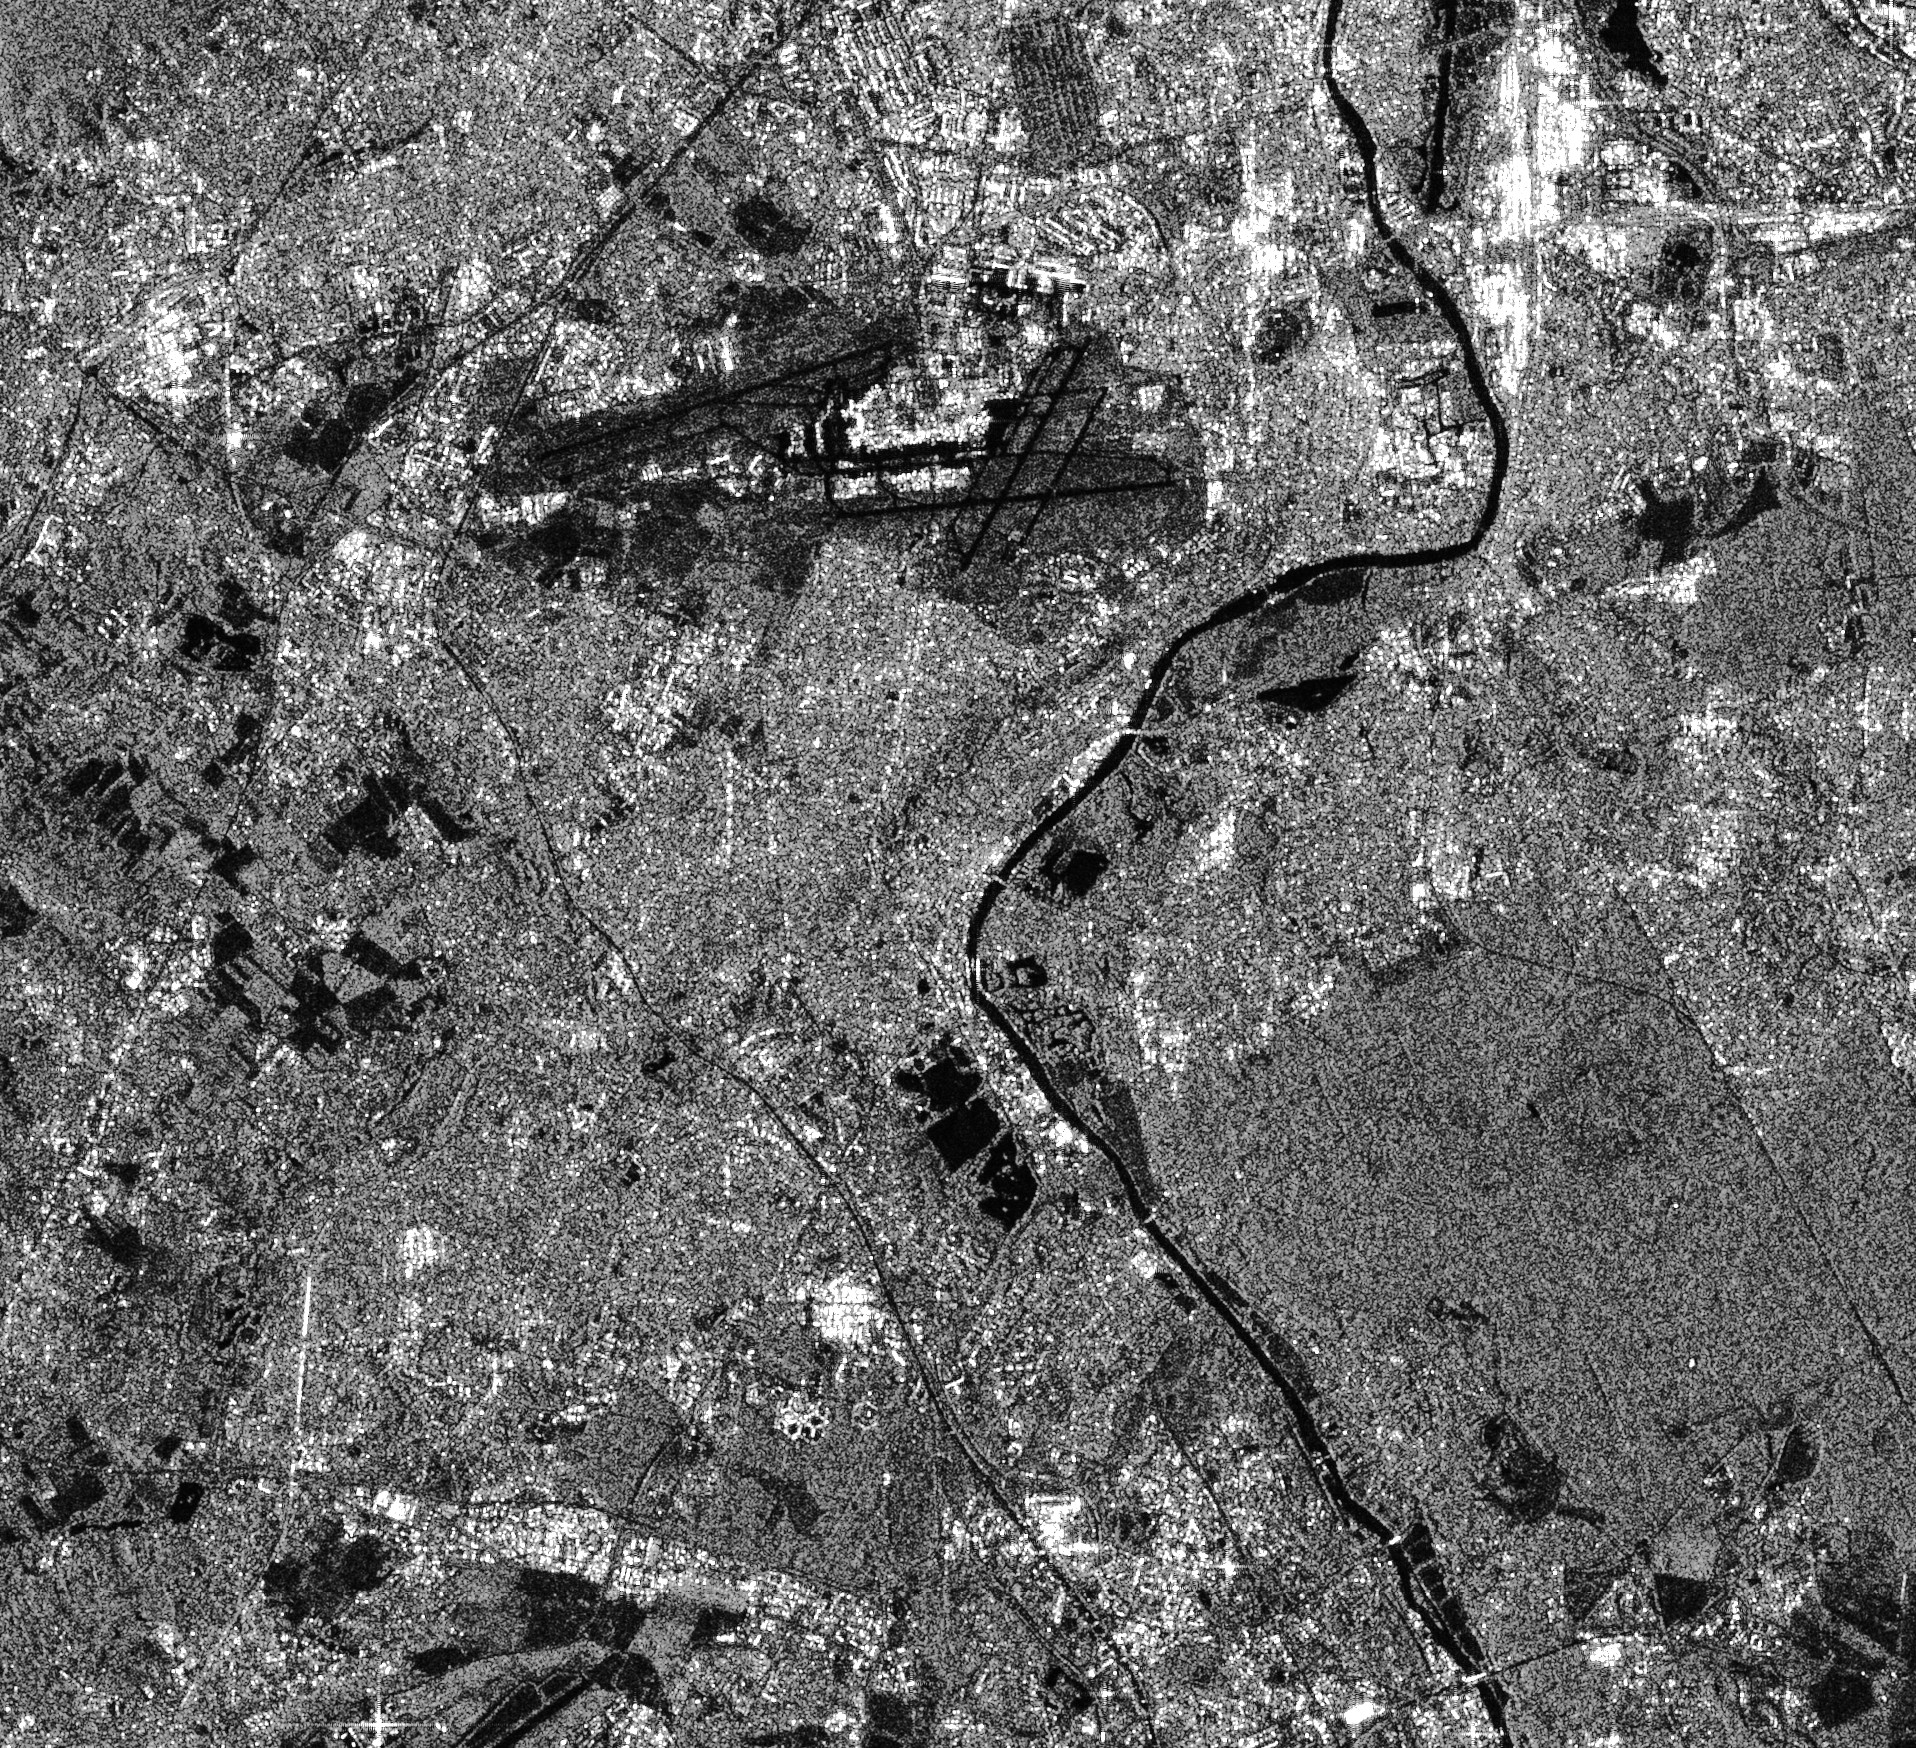 Seine - Orly - Viry-Chatillon - Ris-Orangis - Grigny - Corbeil-Essonne - Inondations - Juin 2016 - Sentinel-1A - Satellite - ESA - Copernicus